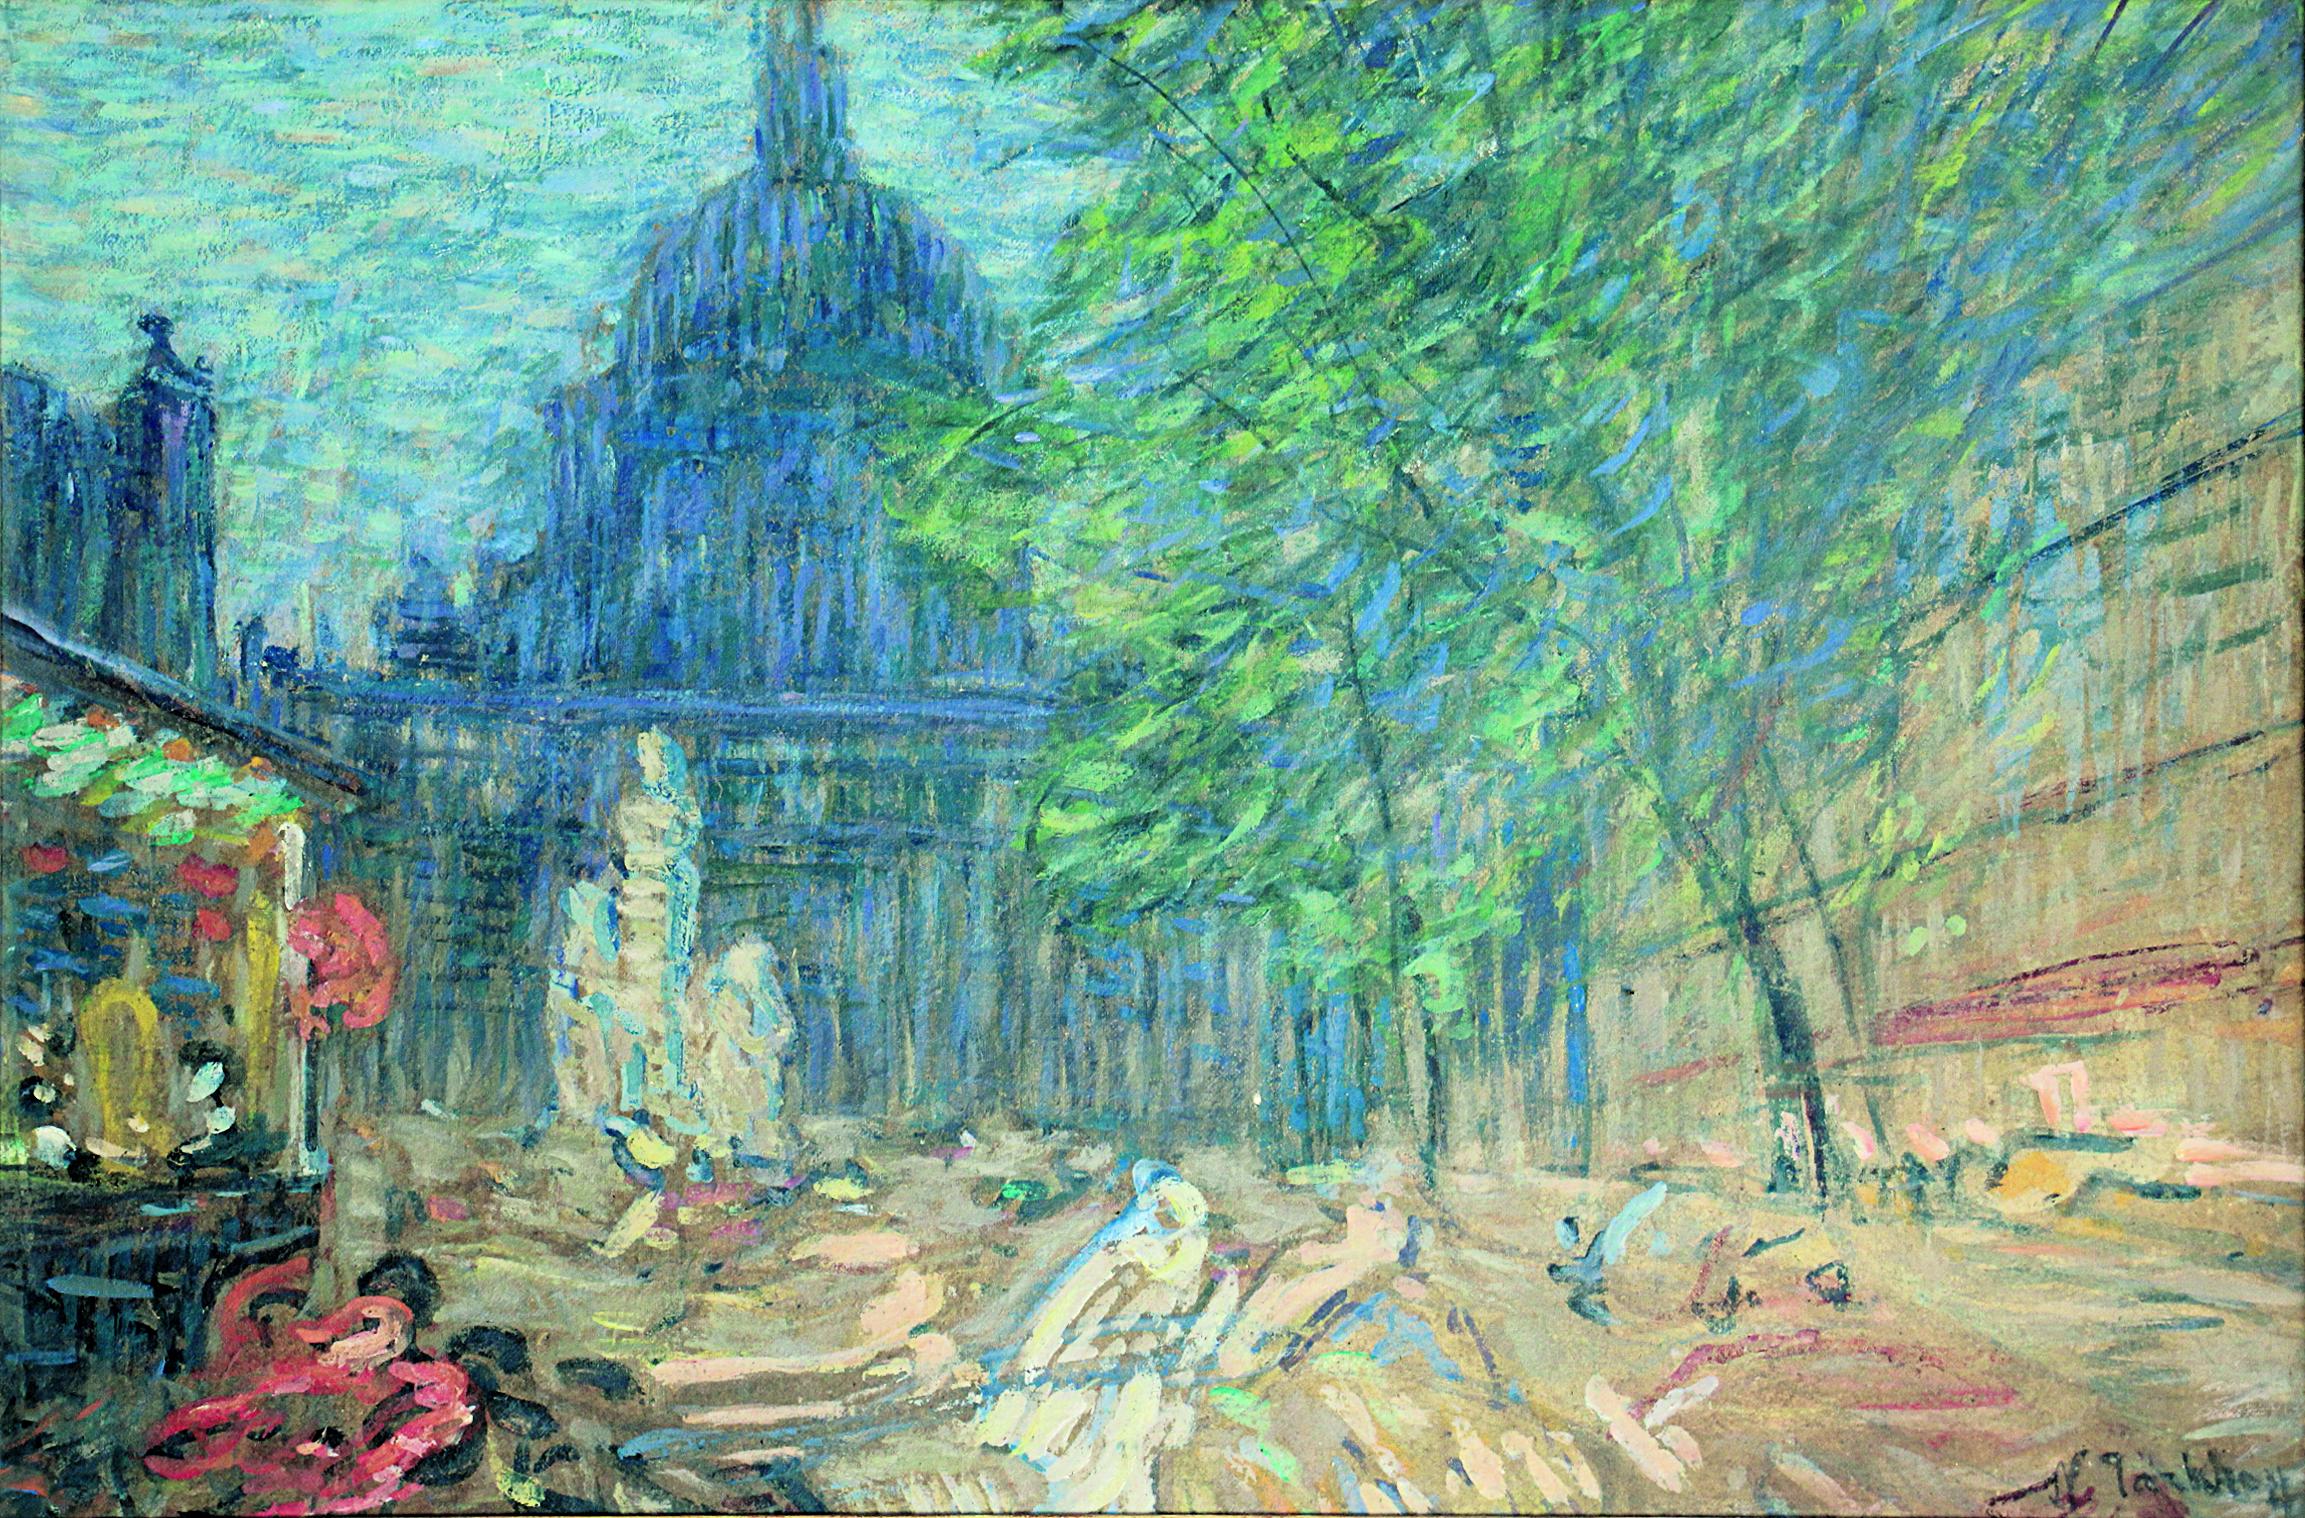 Exposition Nicolas Tarkhoff Impressions D Un Peintre Russe De Paris A Orsay Arts In The City